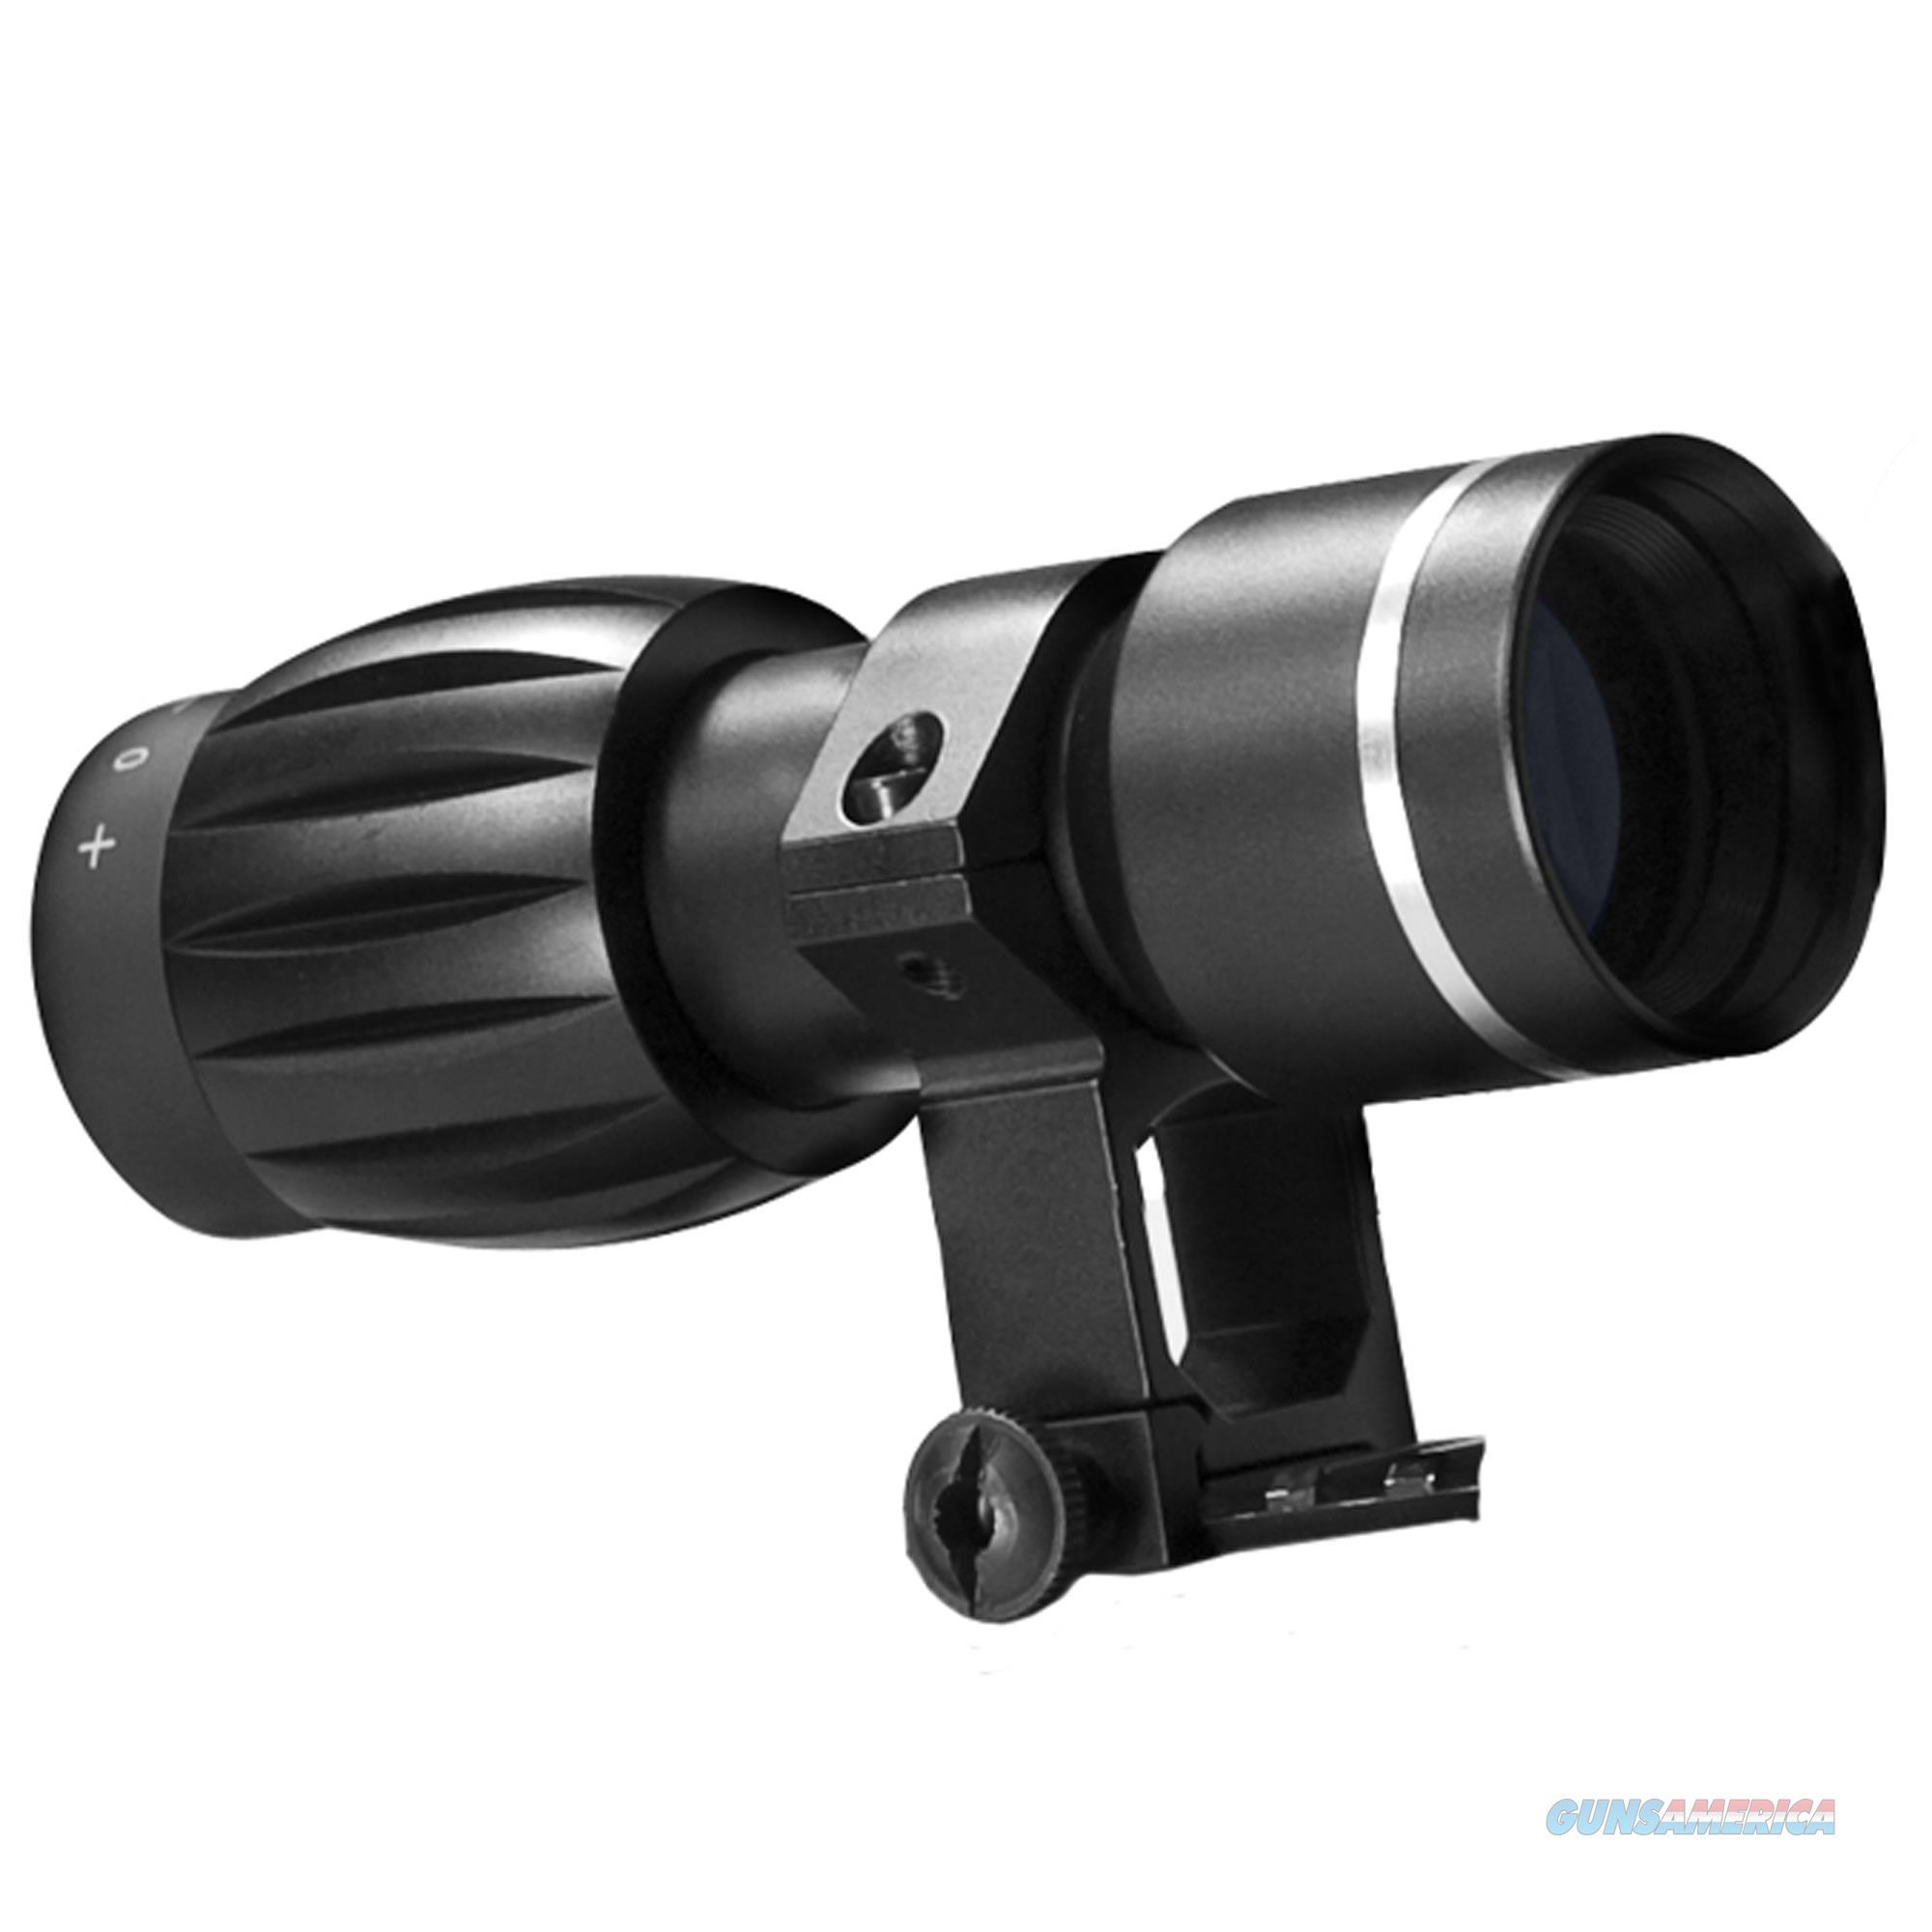 Barska Optics Magnifier AW11622  Non-Guns > Scopes/Mounts/Rings & Optics > Mounts > Other